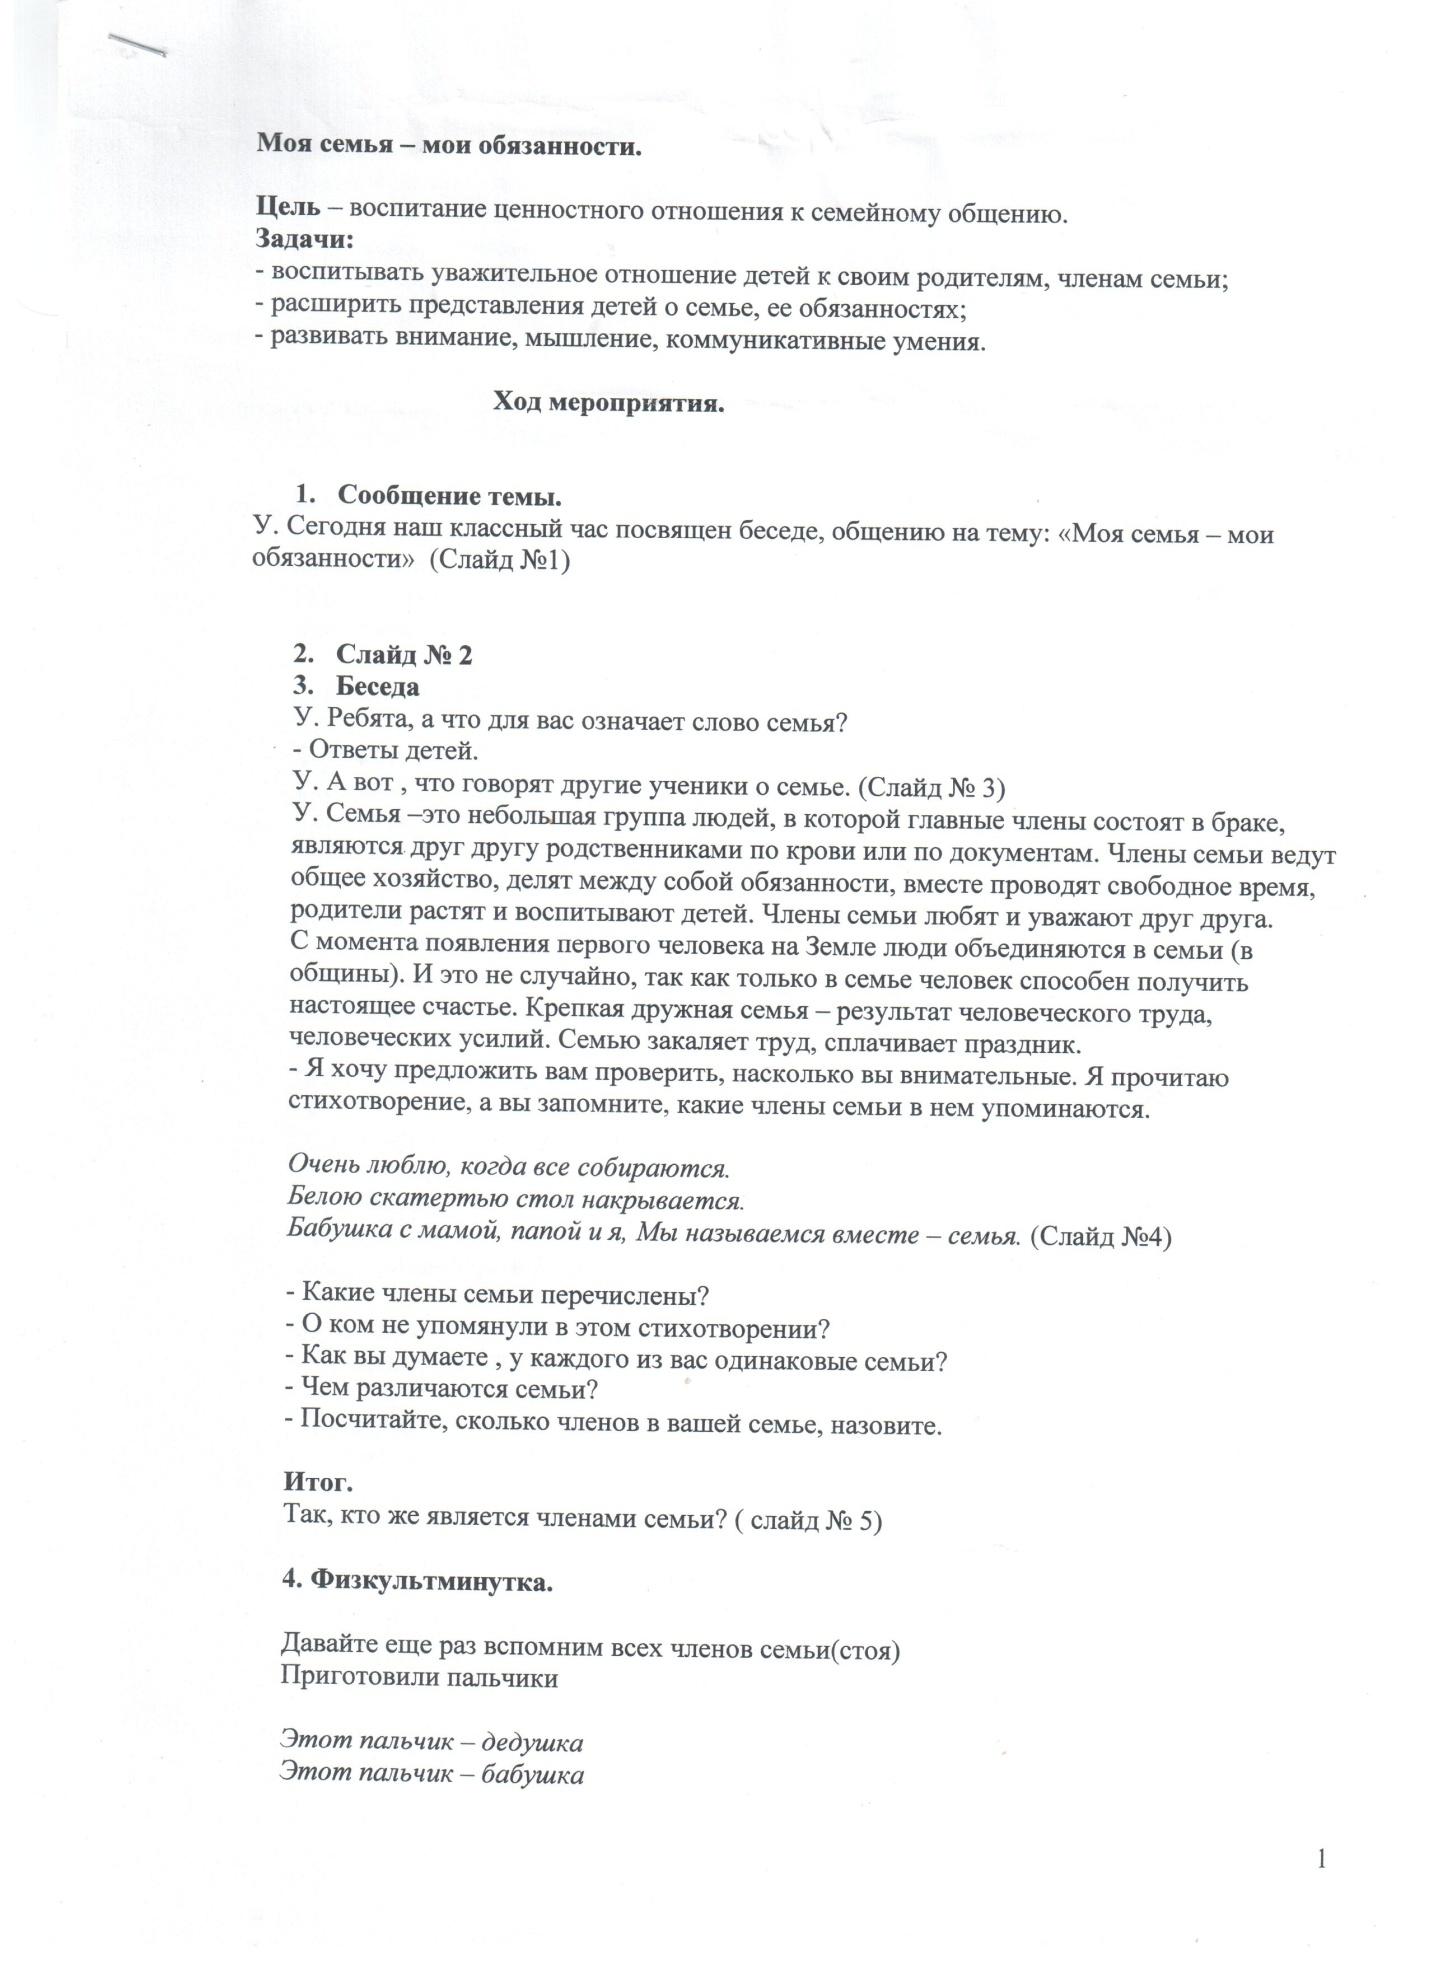 C:\Users\uzer\Desktop\2014-07-17 АЕ1\АЕ1 001.jpg